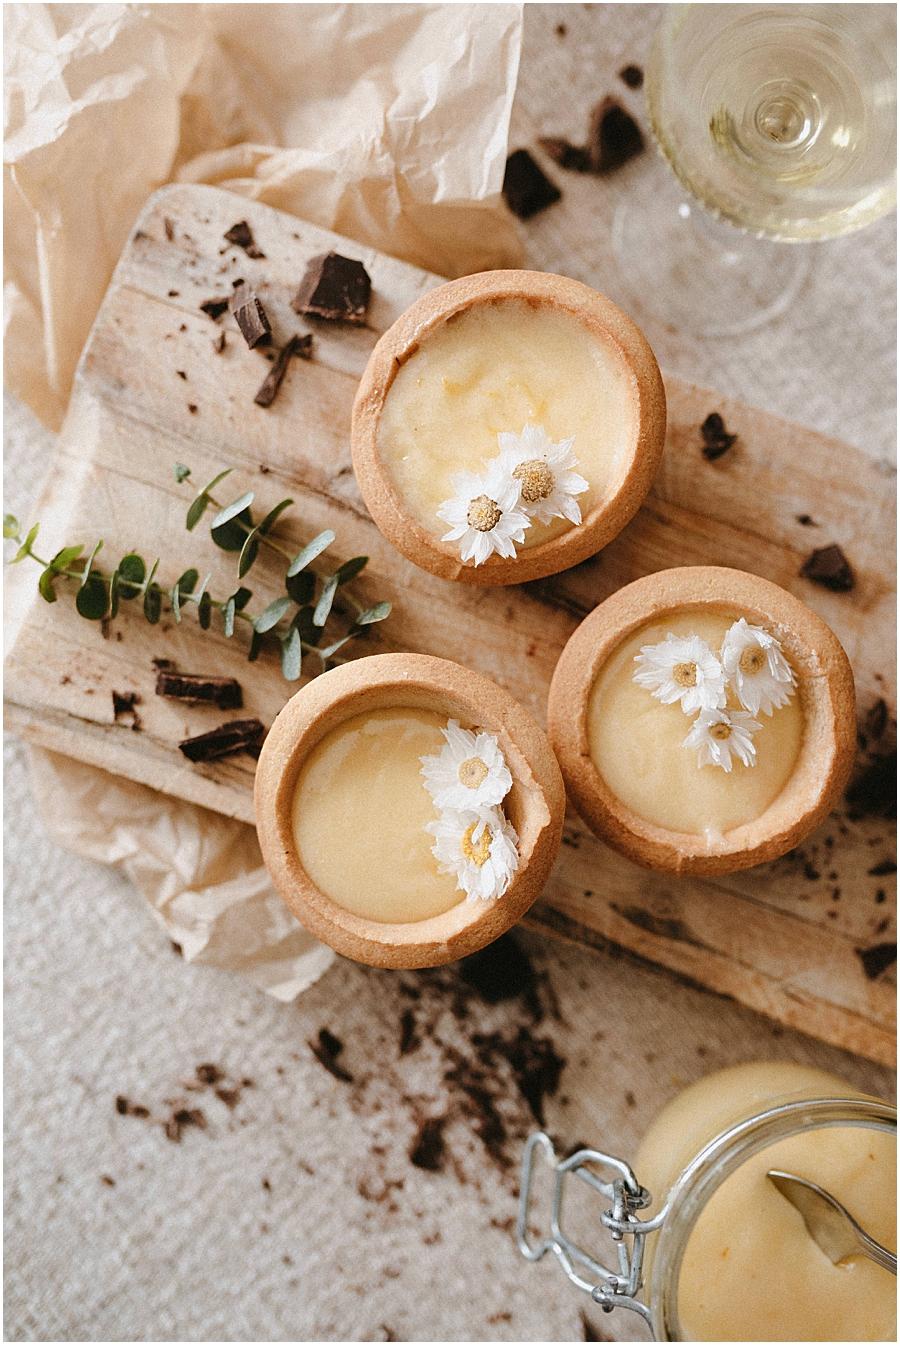 lemon curd limon tartaletas food photography fotografia gastronomica